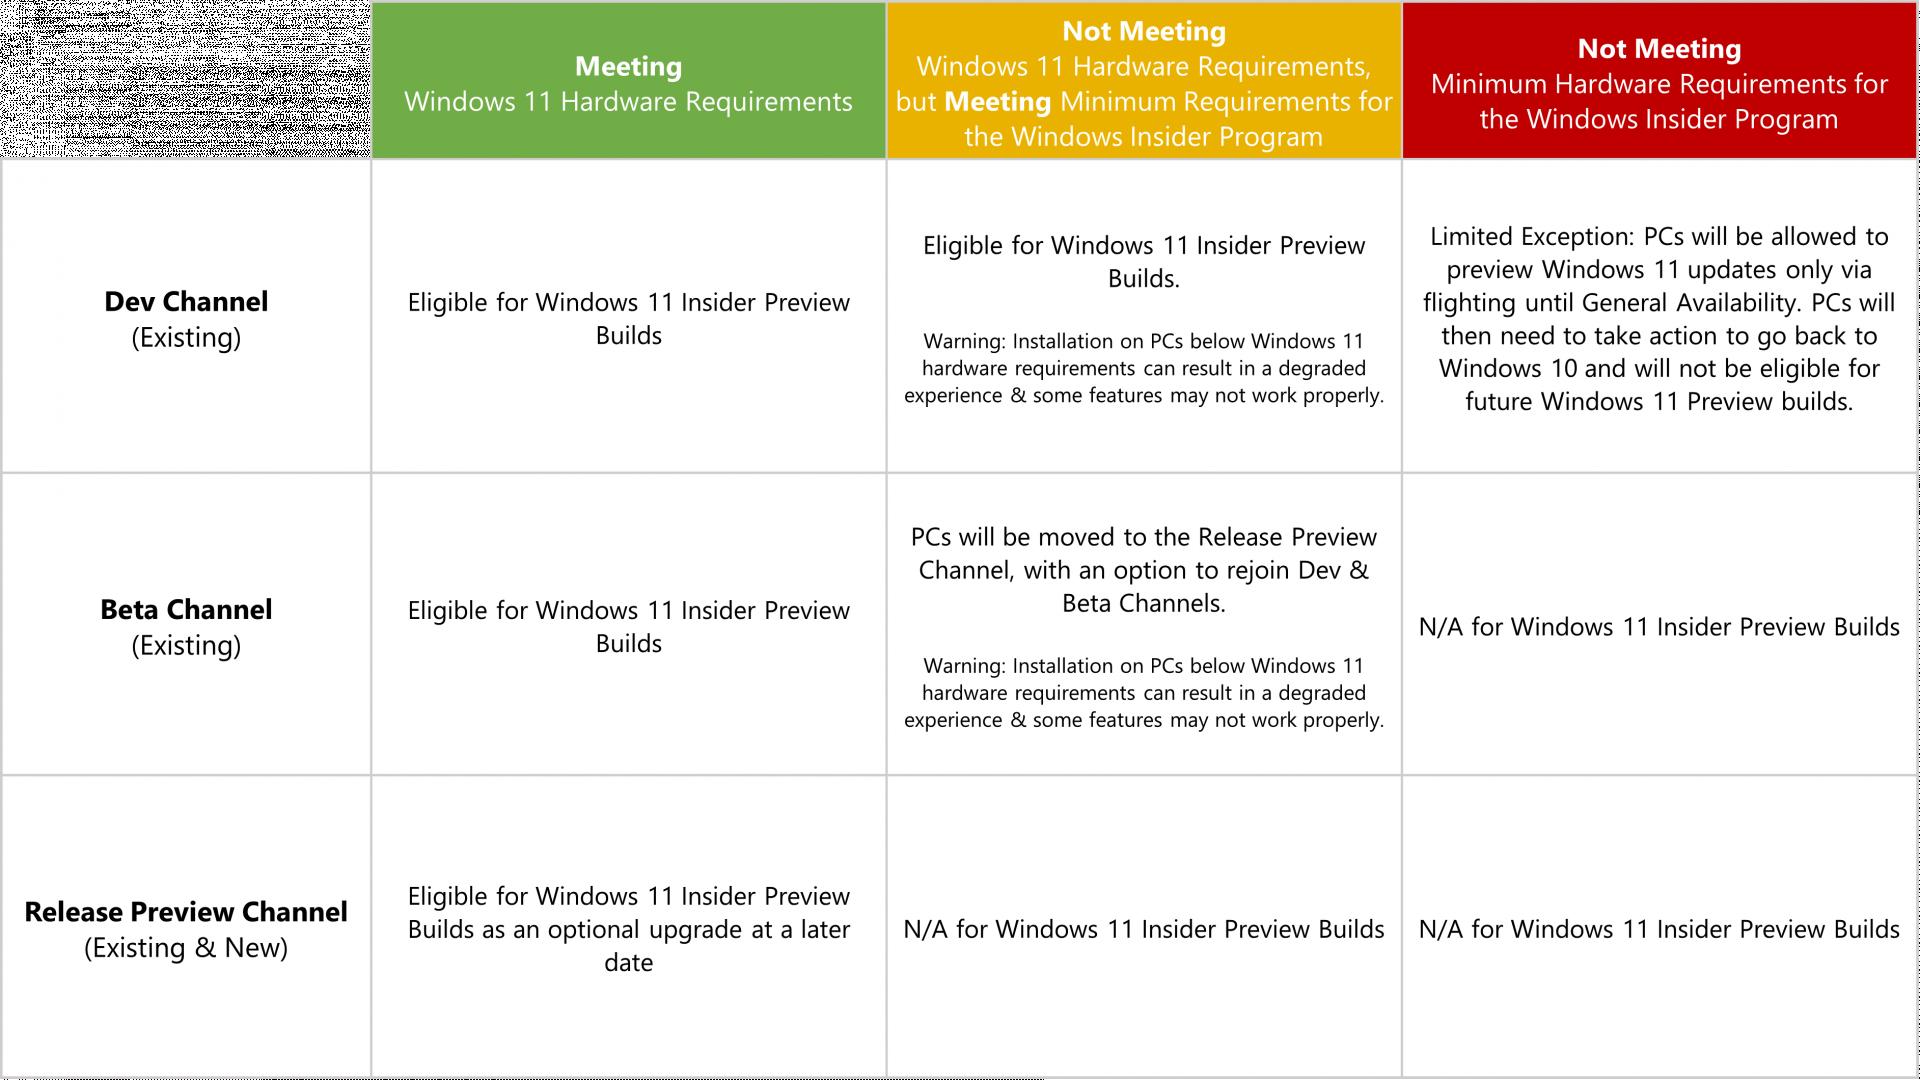 WhyNotWin11 #WhyNotWin11 Windows 11 Win 11 Windows11 Win11 #Windows #11 #Win11 #Windows 11 Win...png